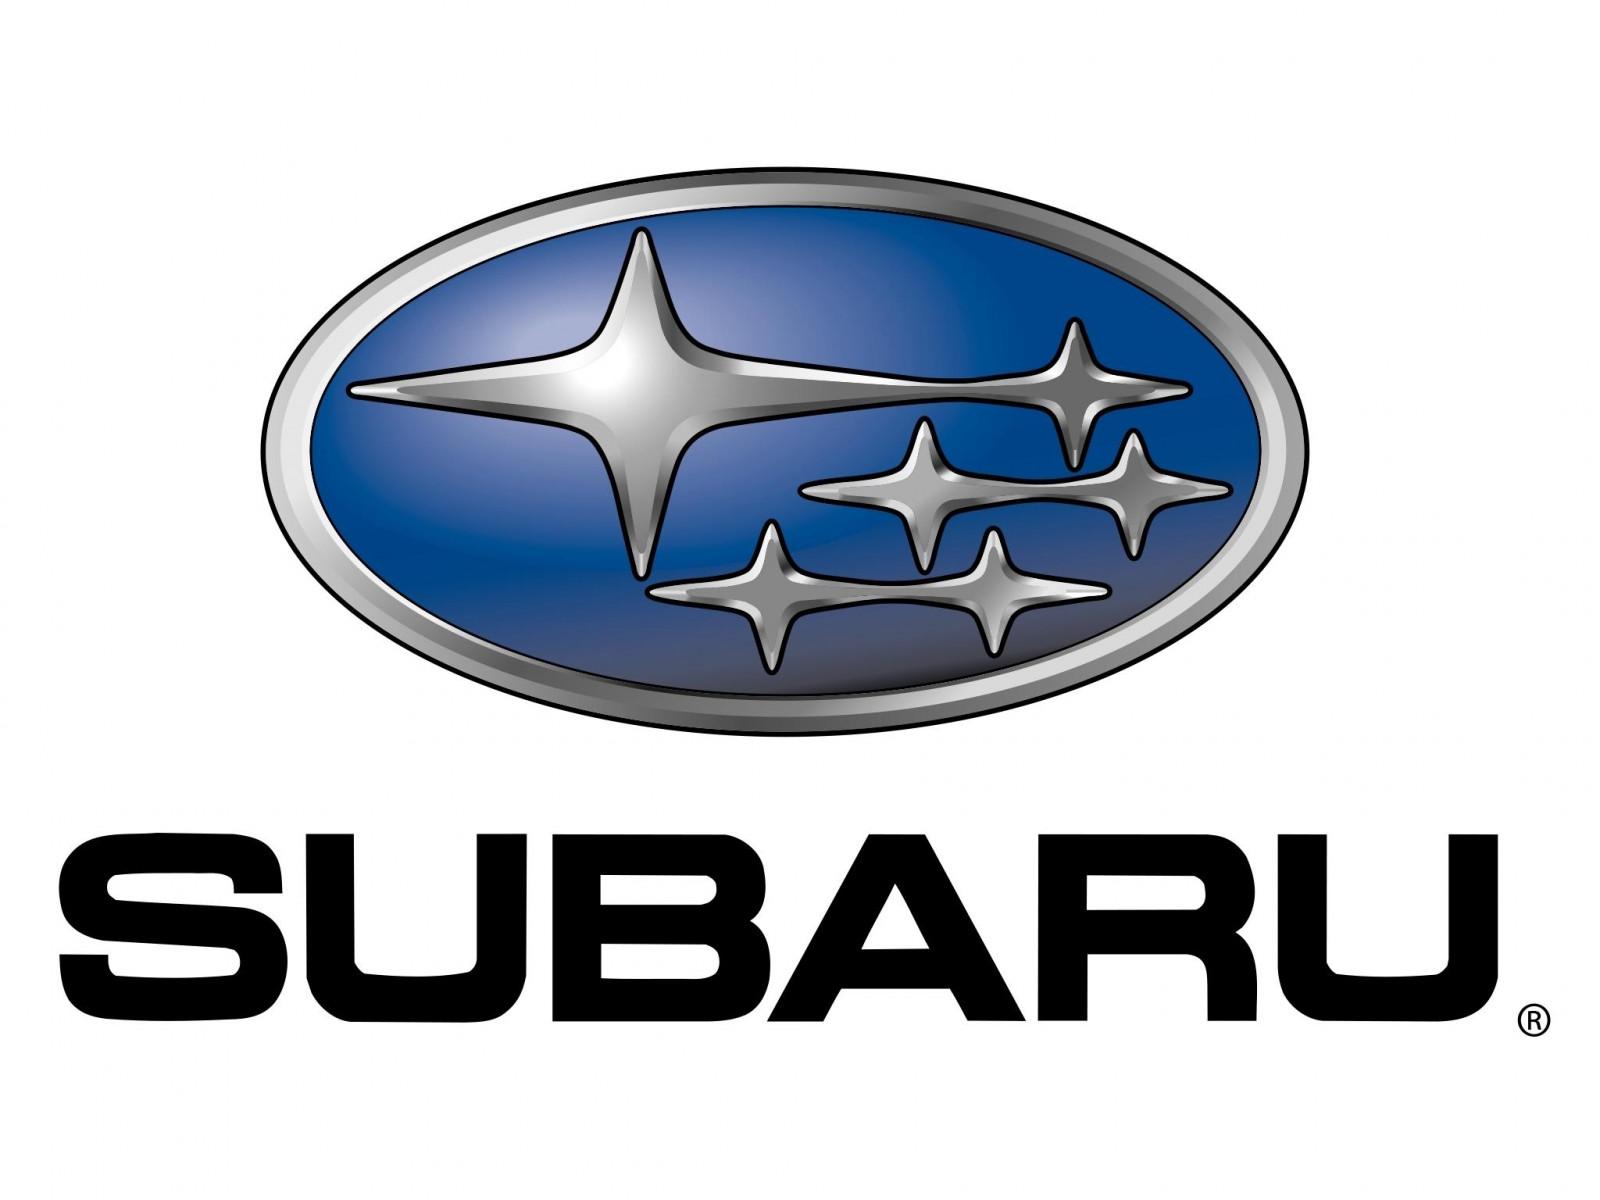 Fond d 39 cran voiture logo compagnie subaru marque for Fond ecran marque